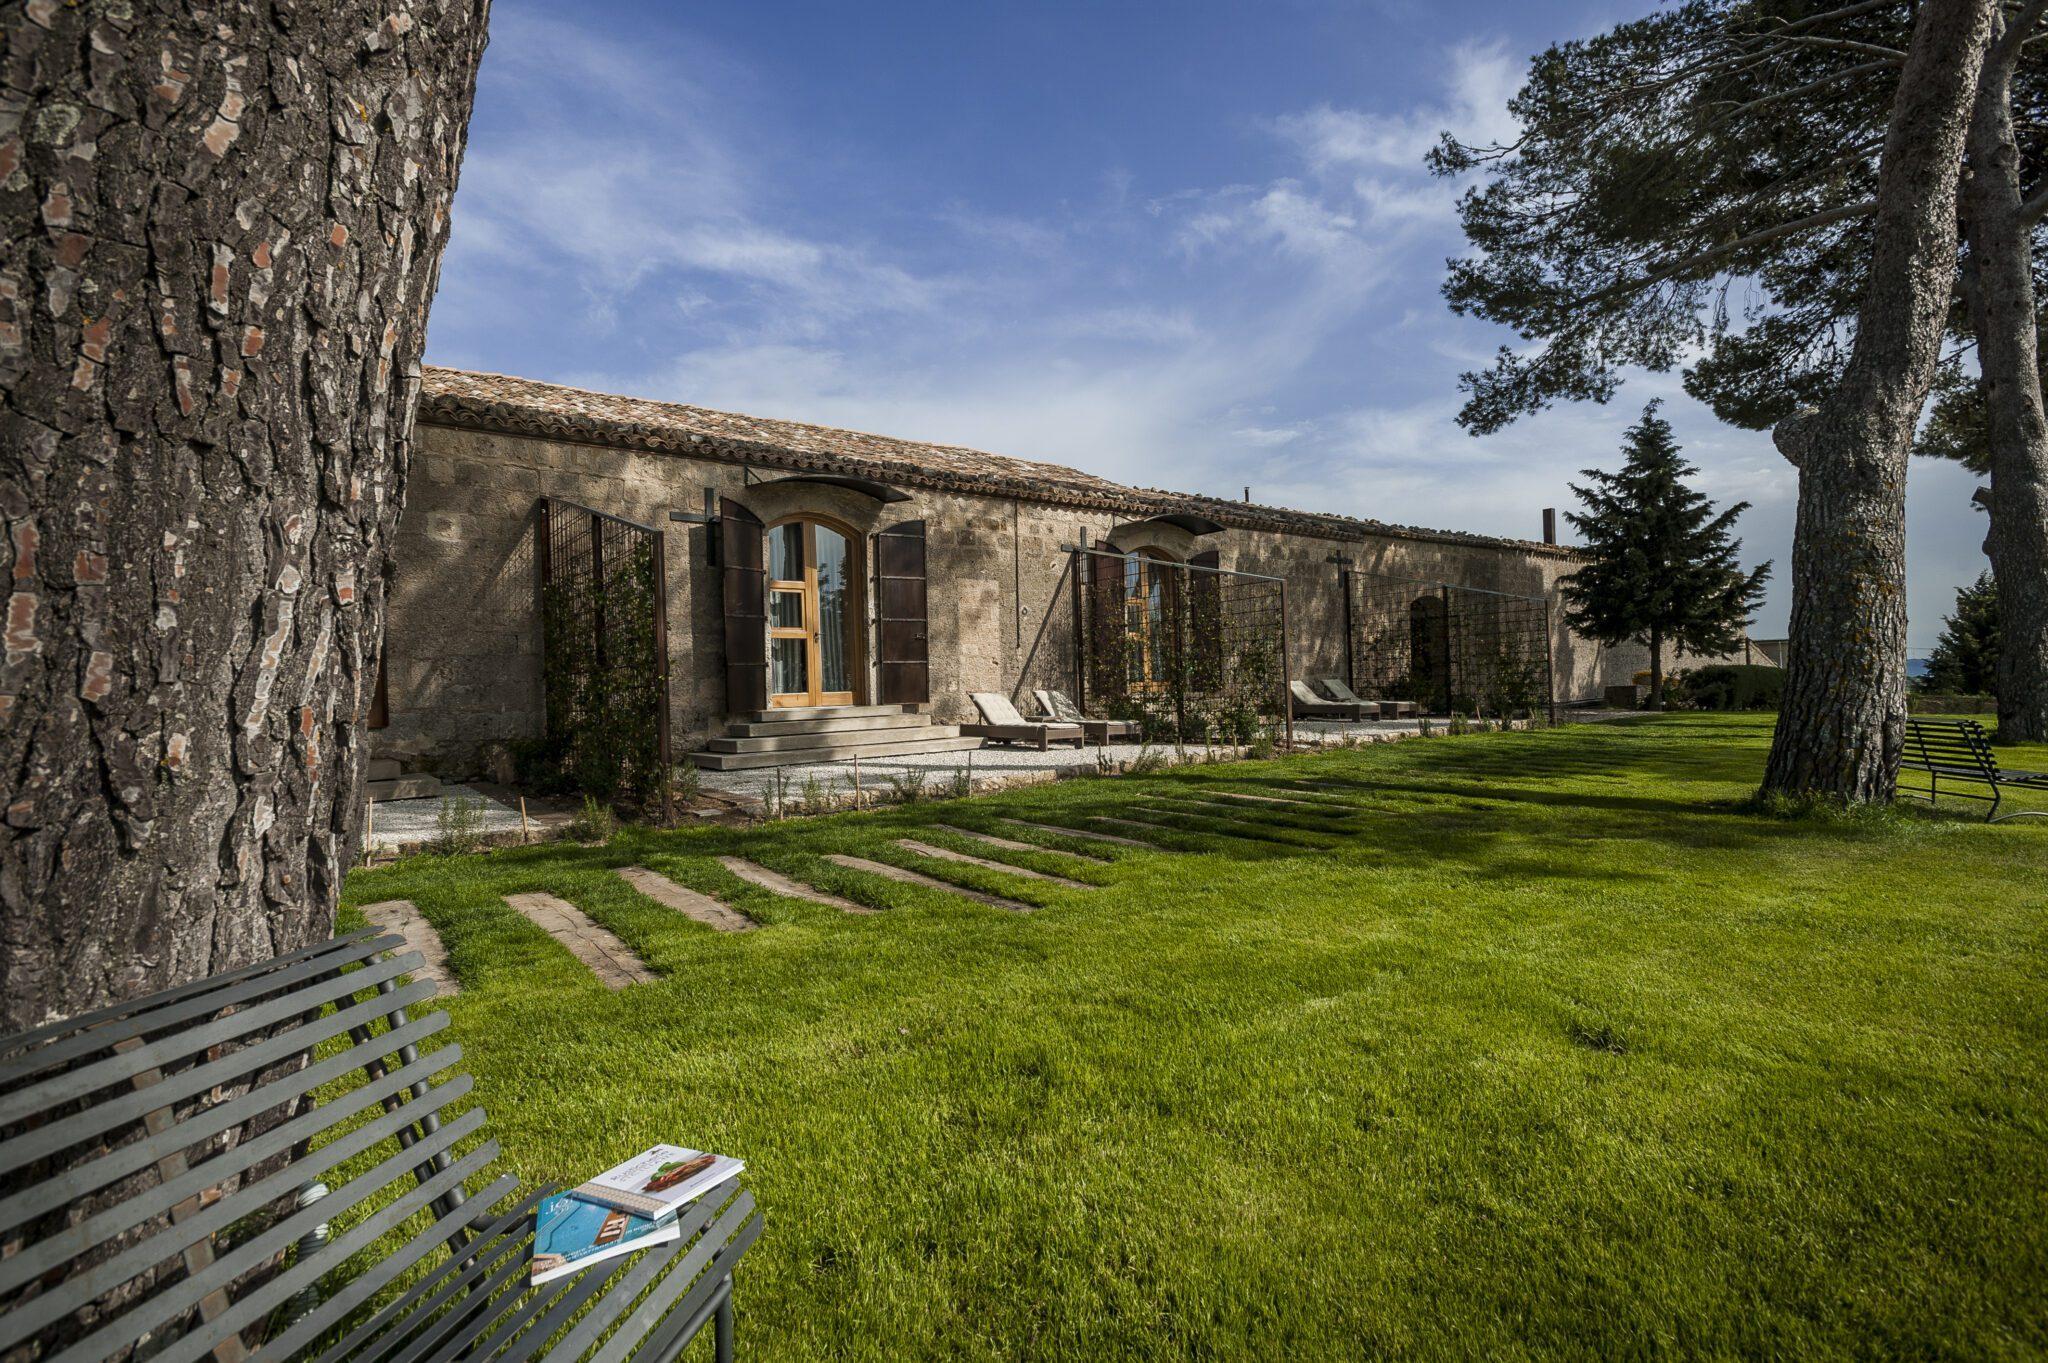 Nest Italy - Farmhouse in Sicily